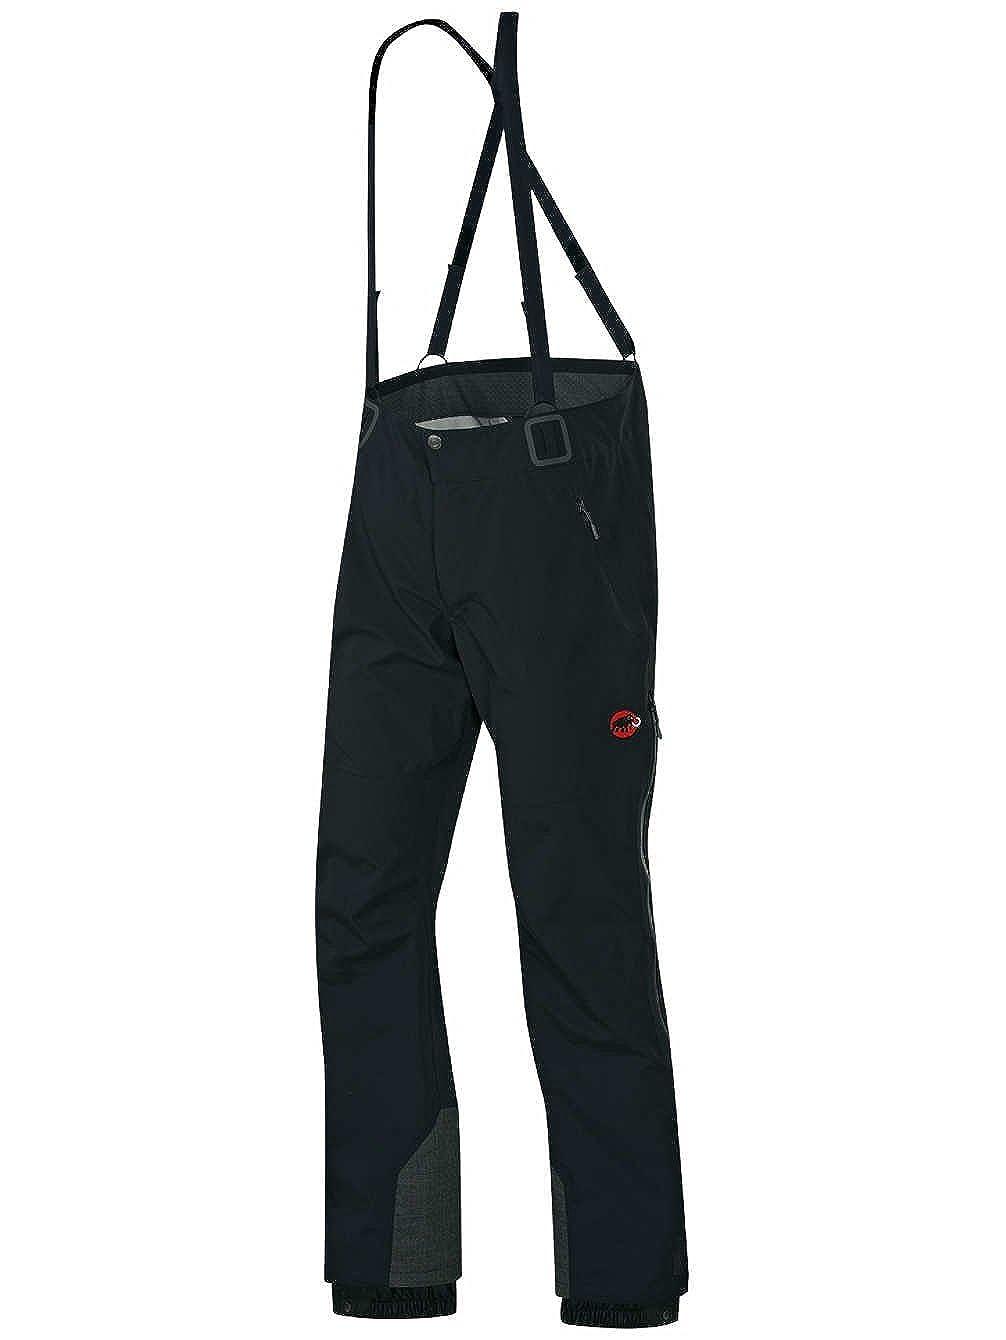 Mammut Splide Pant 1020-05853-0001-54-30 Mens Black 54